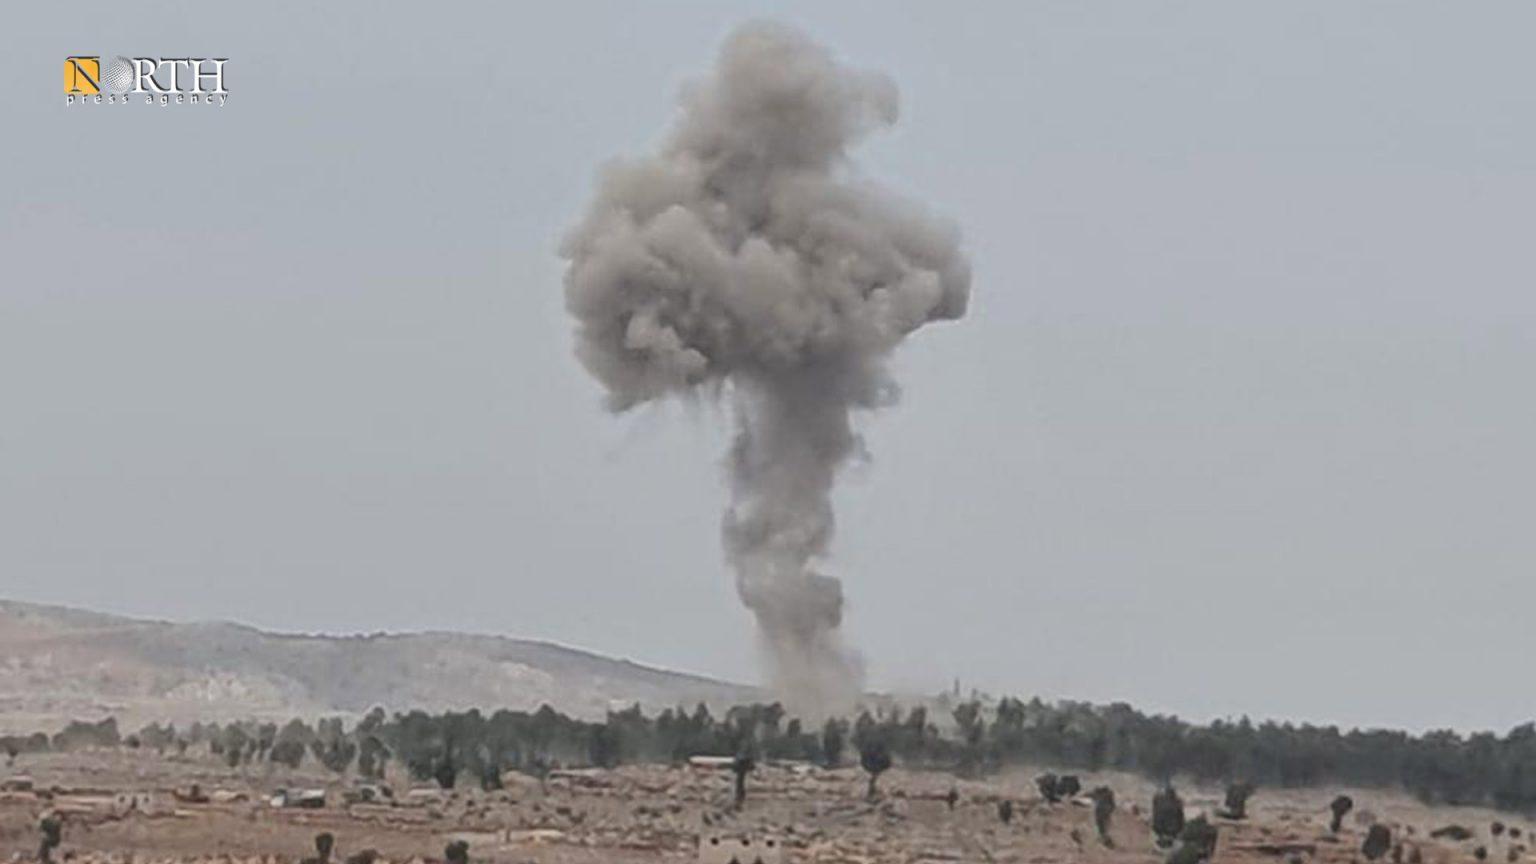 Idlib – bombardment on a village in Zawiya Mountain region – North Press/archive